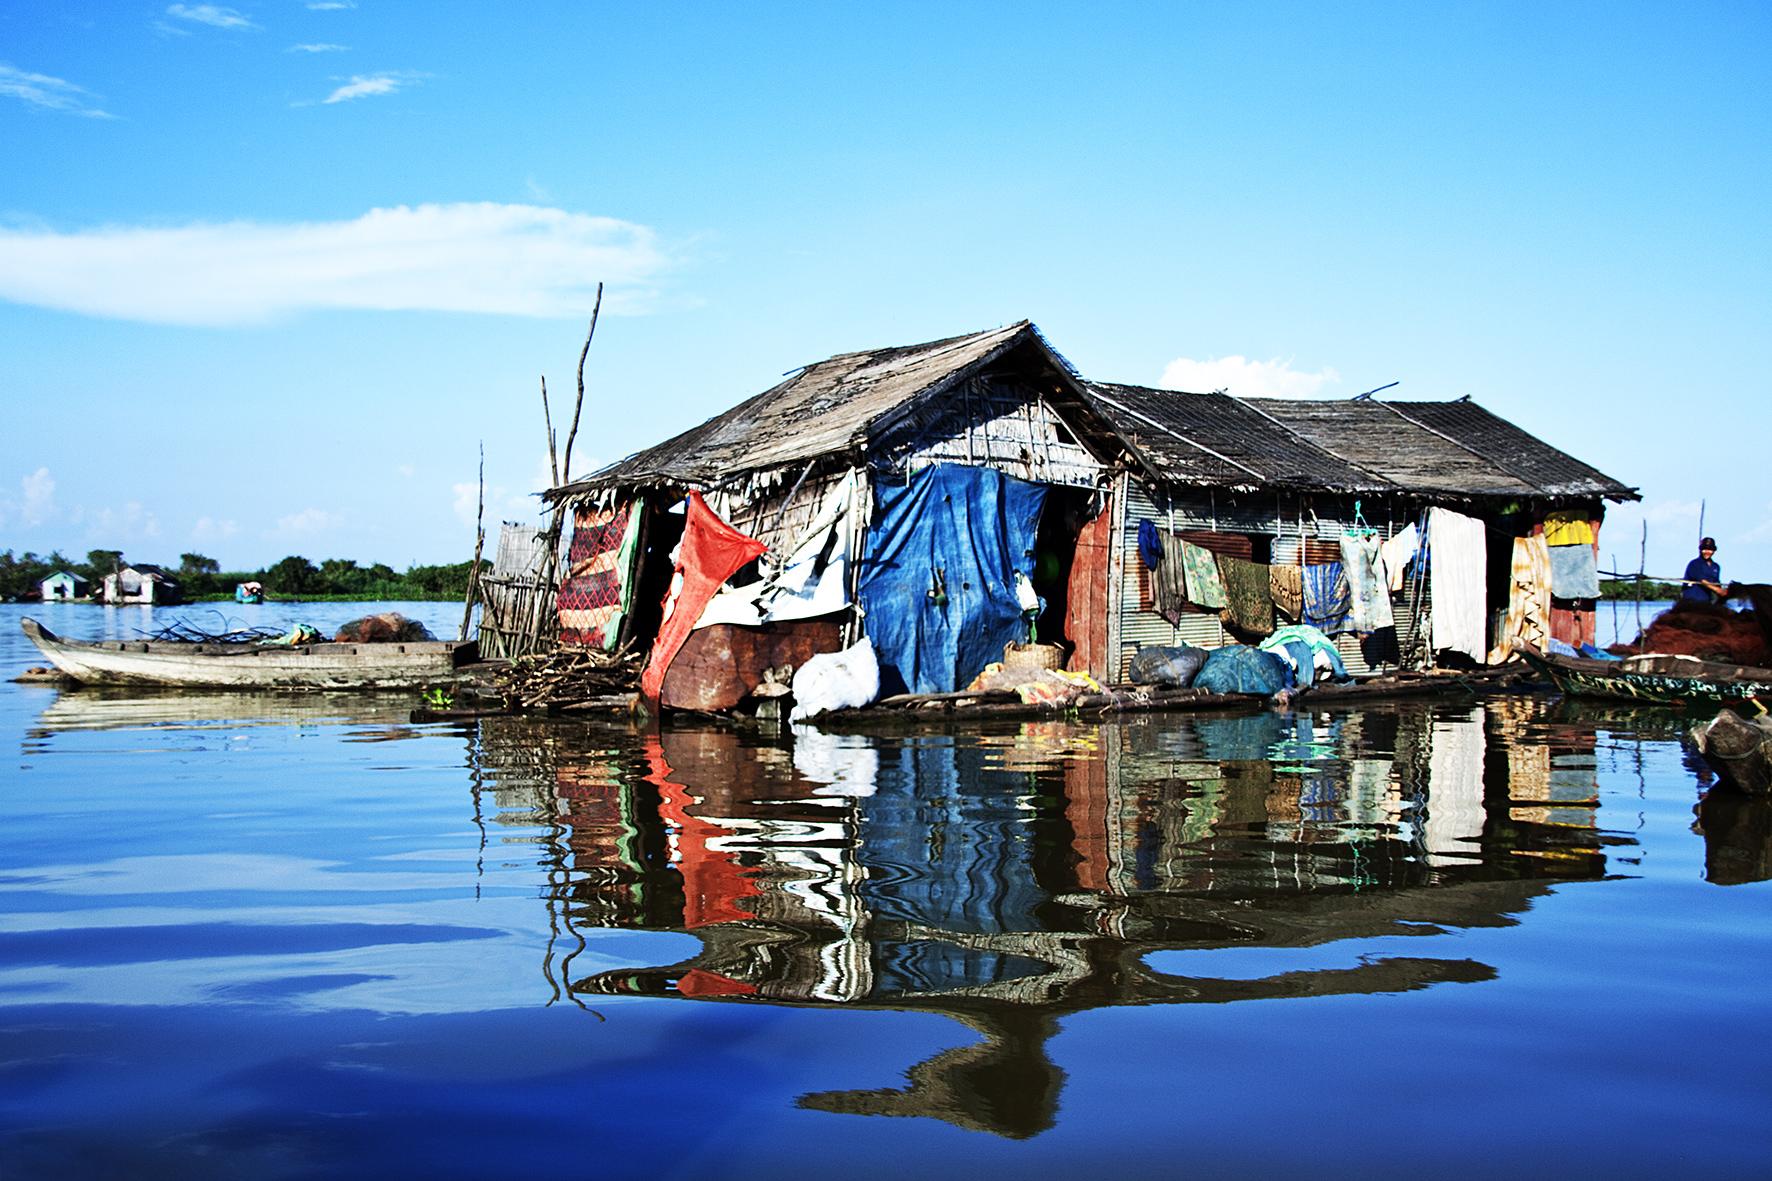 Cambodge, Siem Reap. 2009